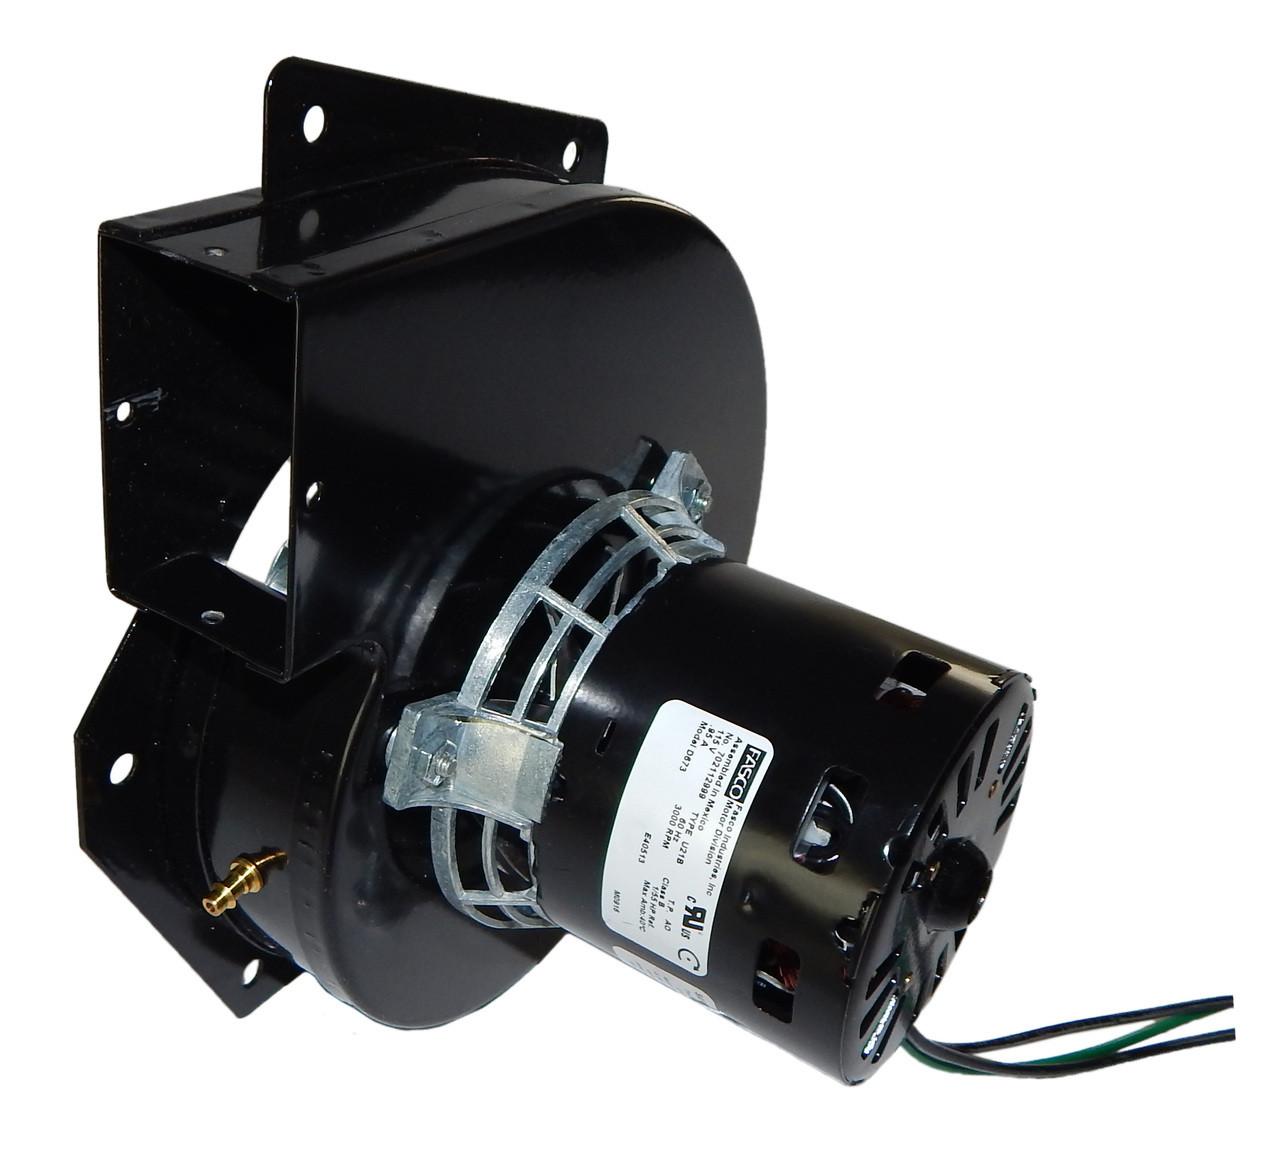 manual d673 46064 1468505744 1280 1280 c 2 rgpn 05eauer wiring diagram rheem rgps rheem rudd furnace blower motors  [ 1280 x 1169 Pixel ]